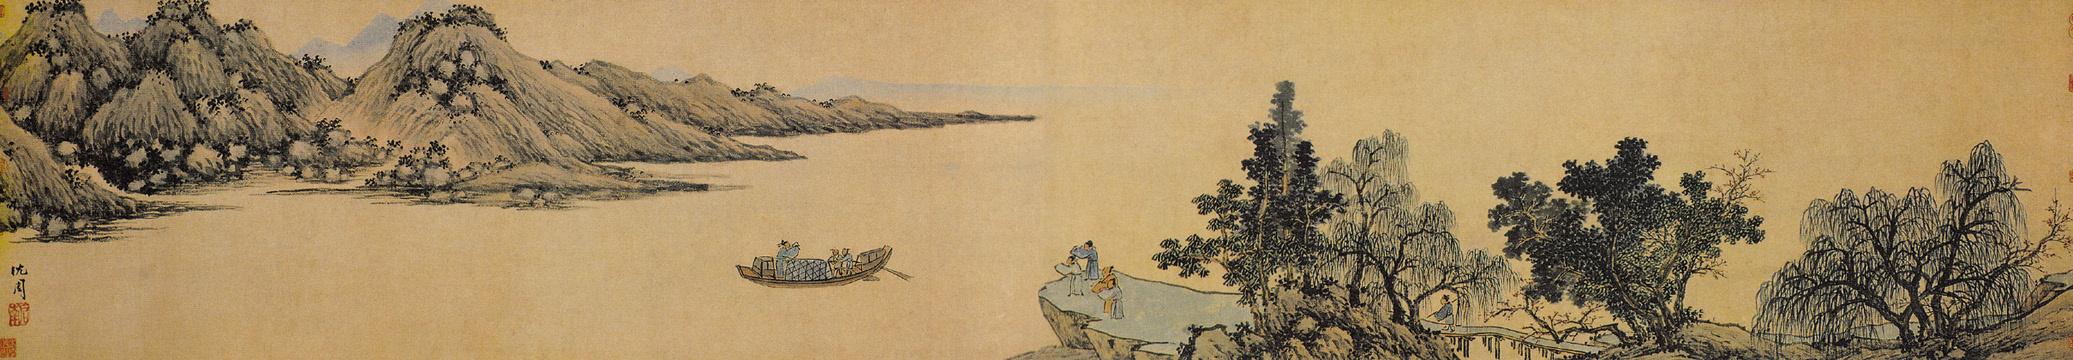 Shen Zhou. Saying good-bye by the river